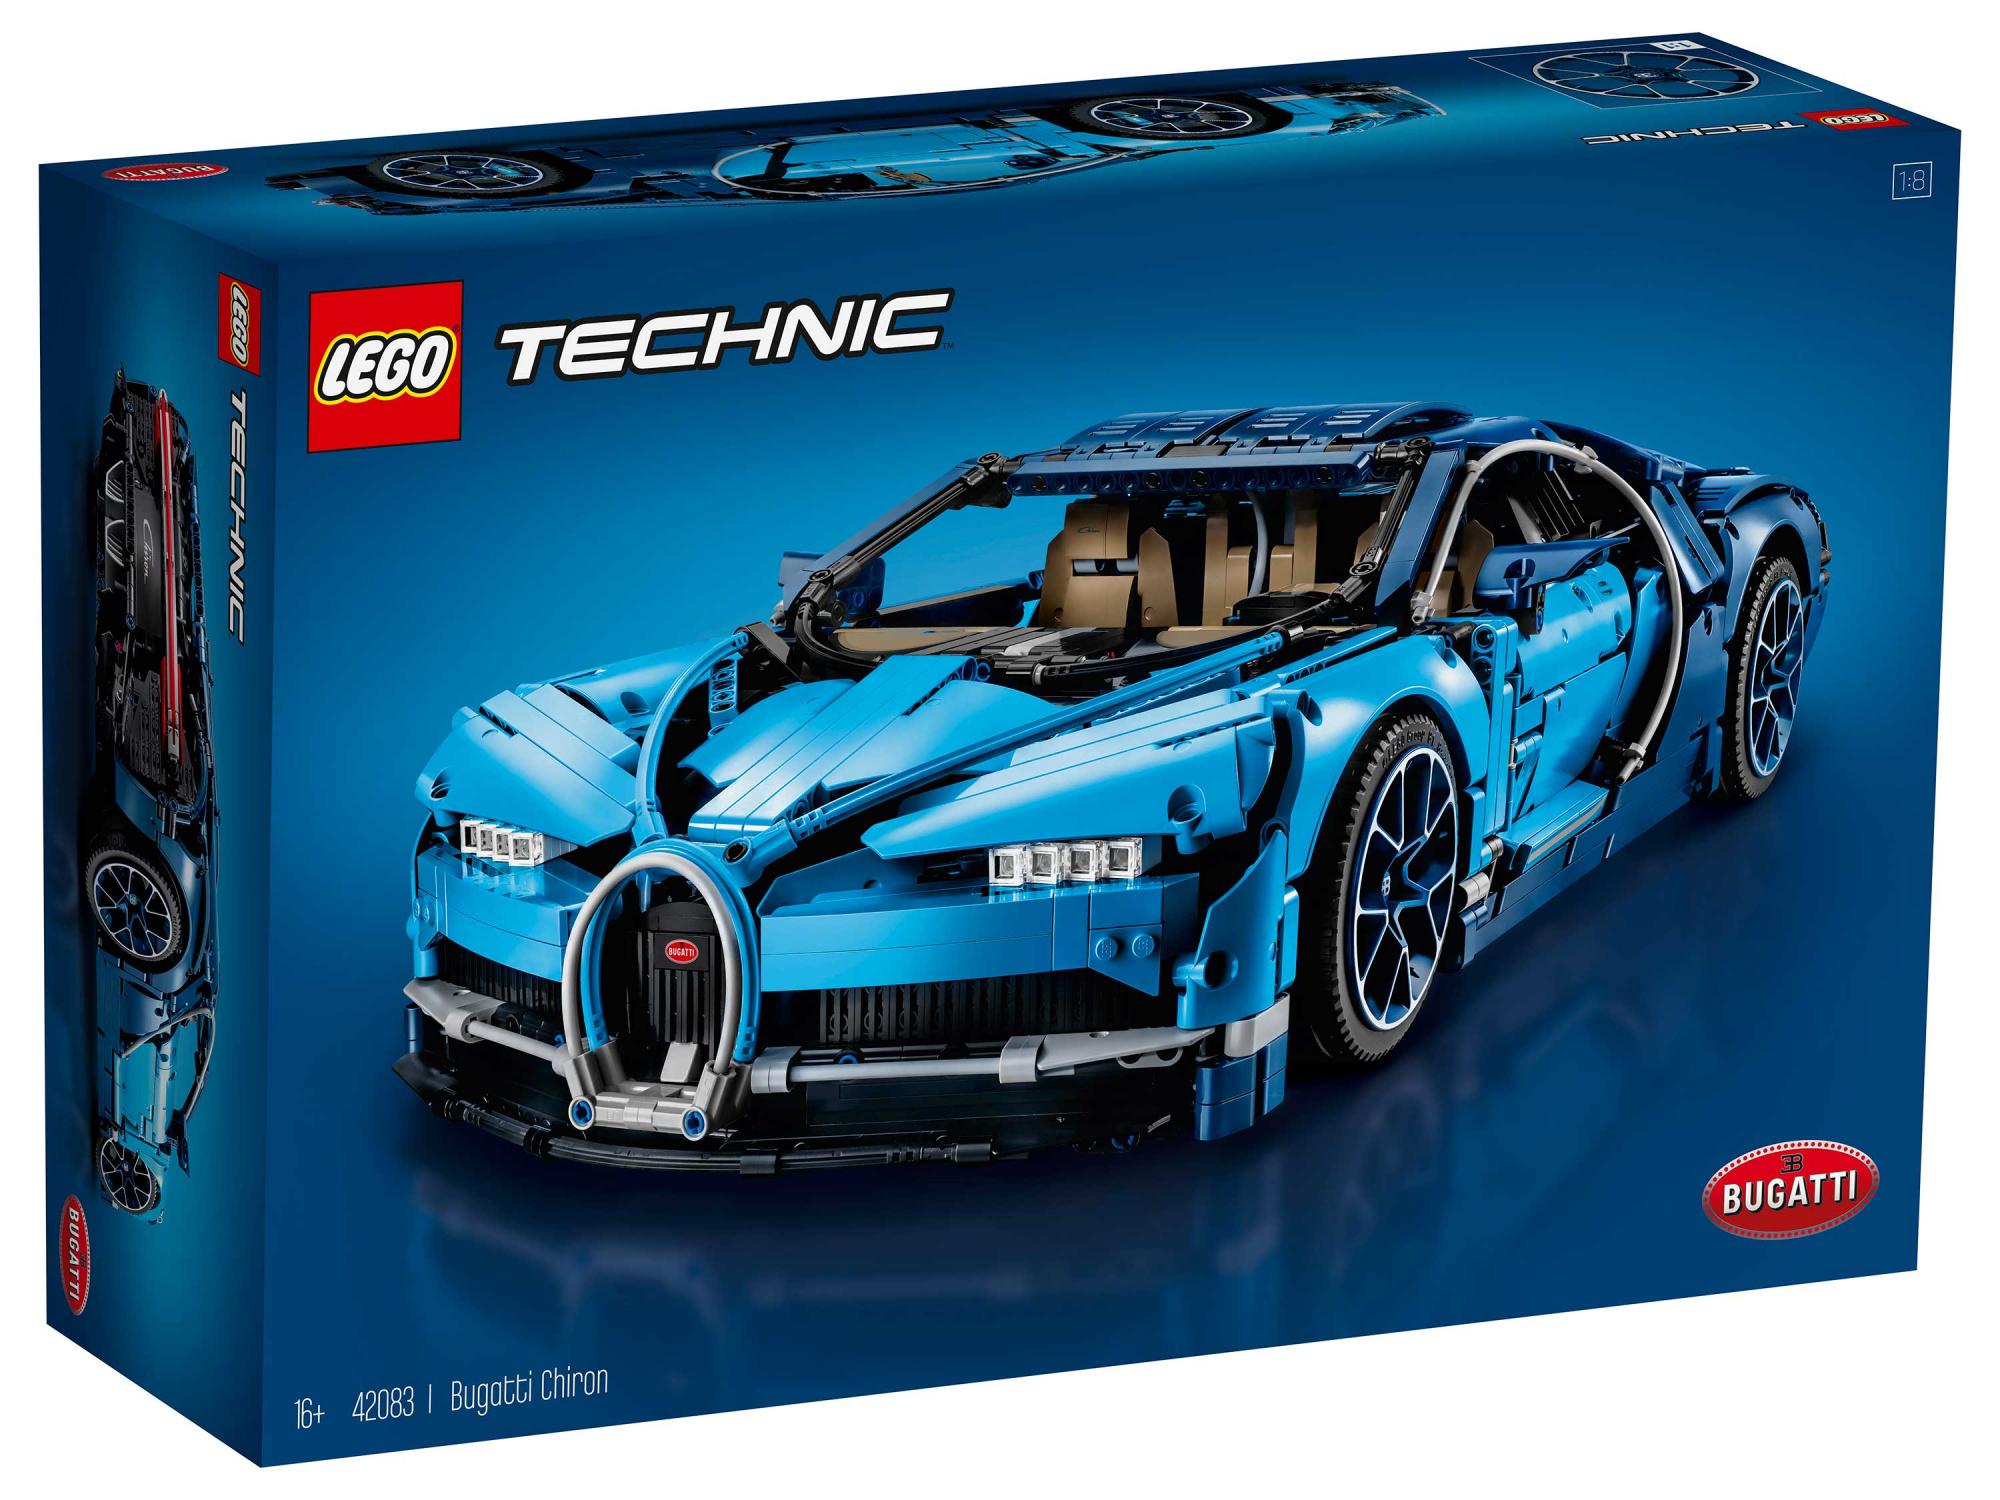 Конструктор Lego Technic Bugatti Chiron 42083 Blue